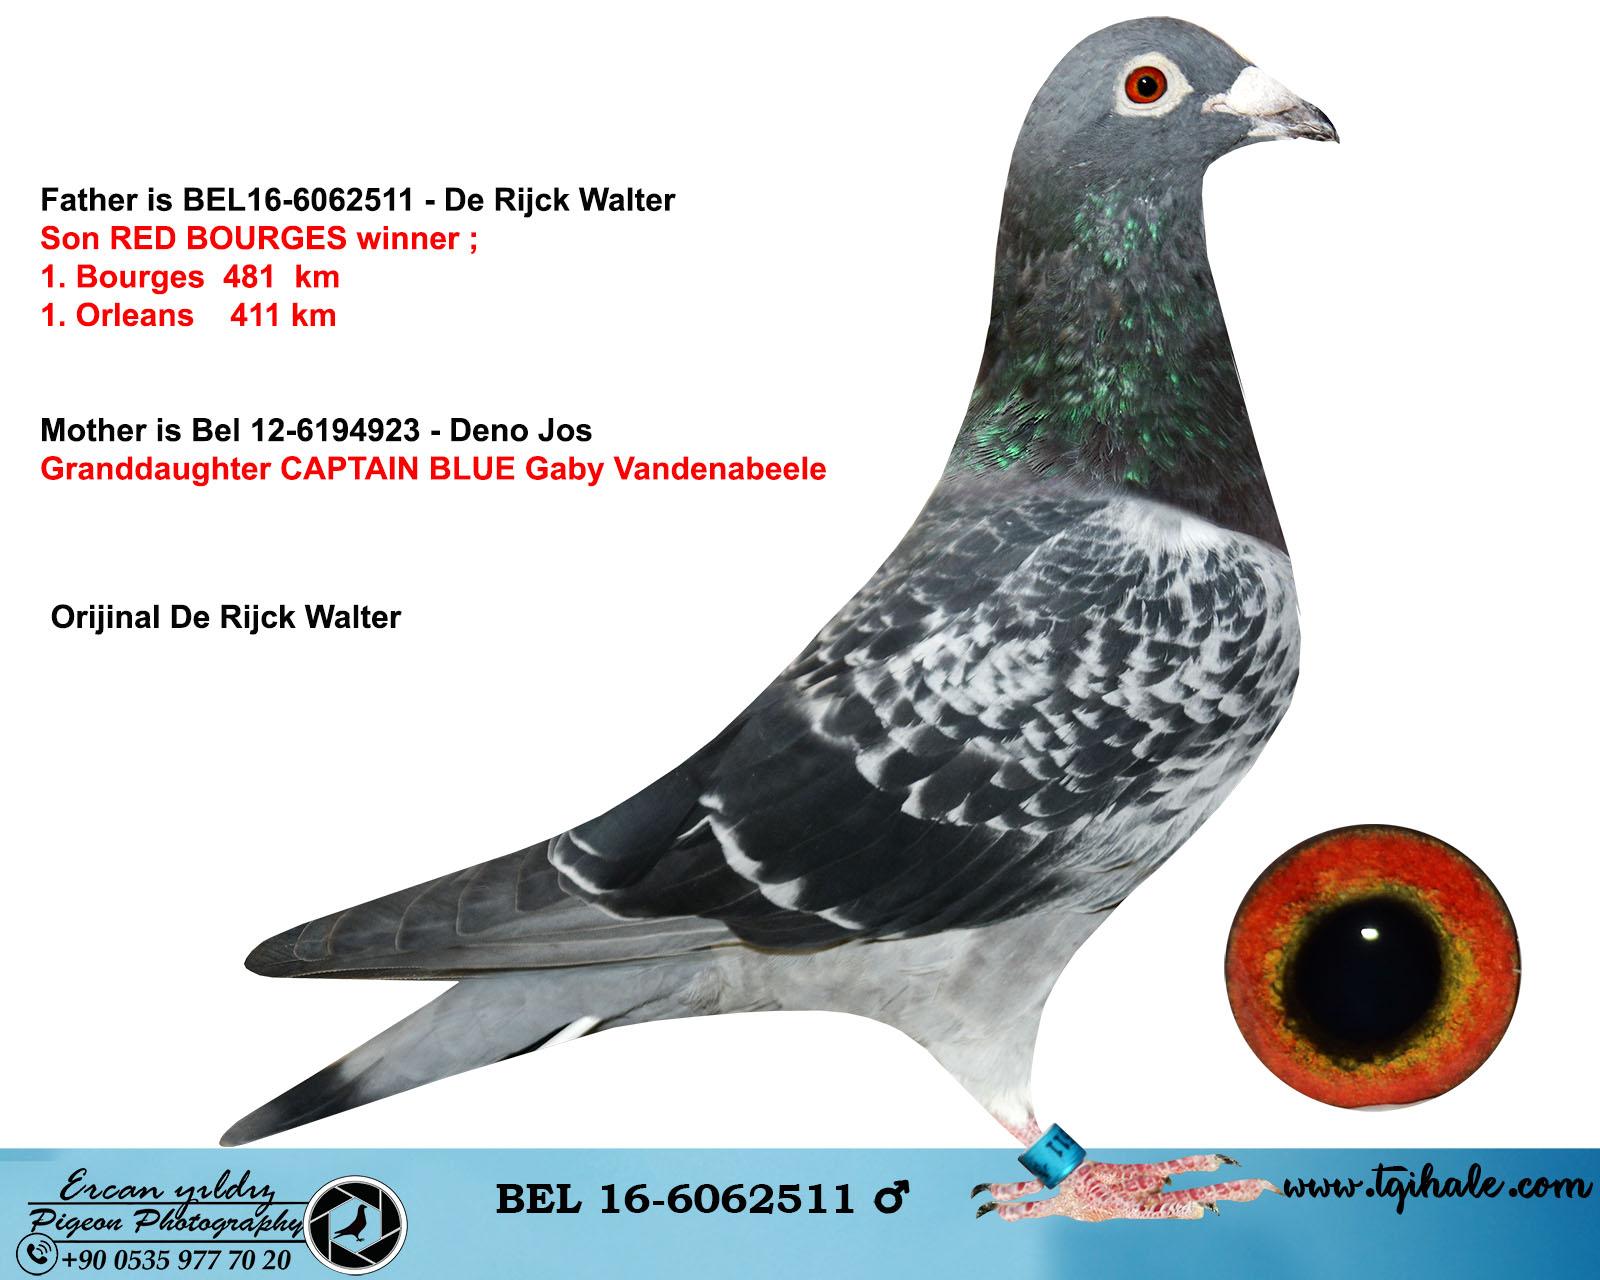 BEL16-6062511 ERKEK / ORİJİNAL DE RİJCK WALTER